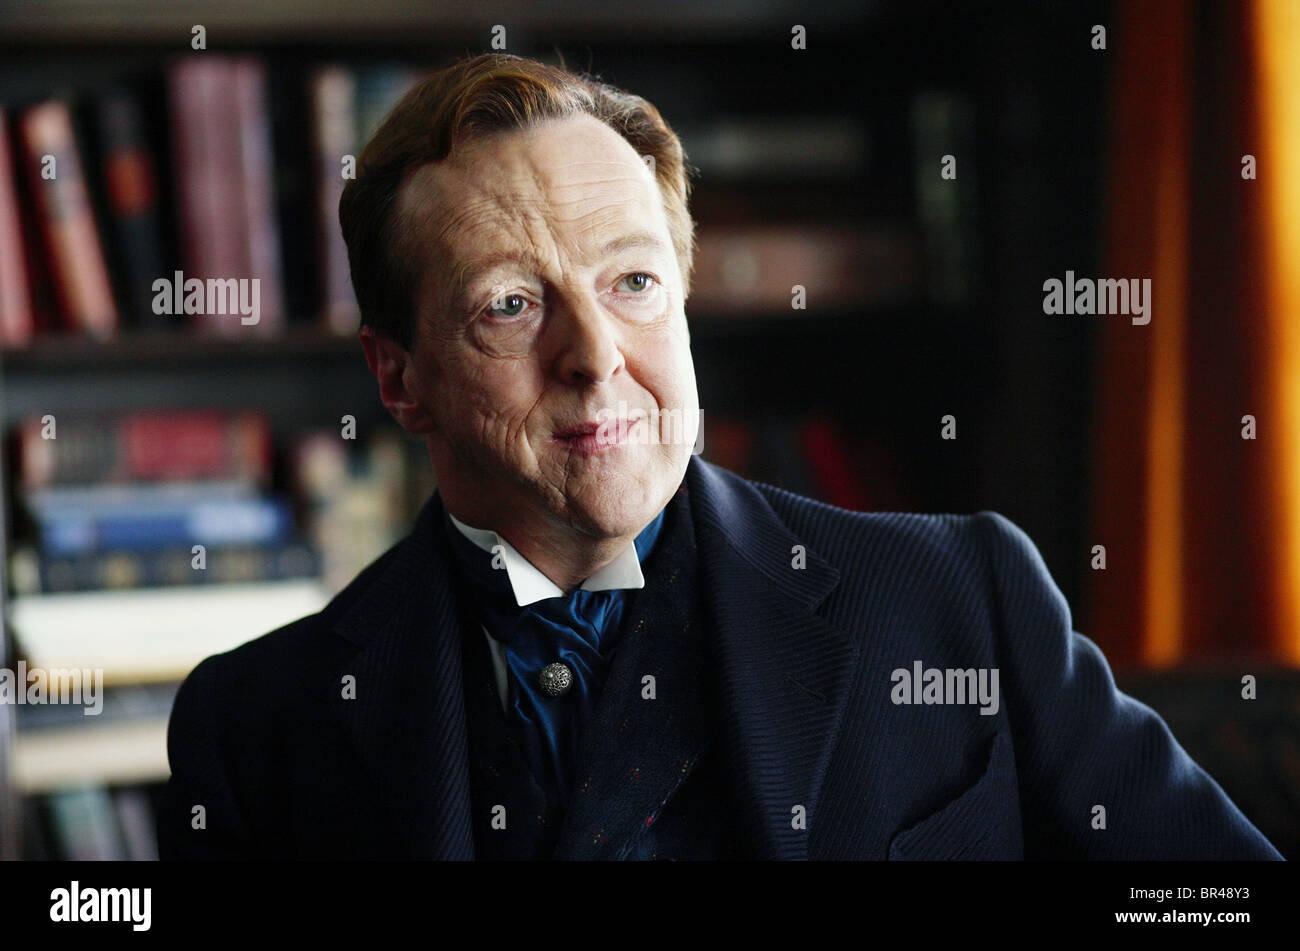 EDWARD HIBBERT THE PRESTIGE (2006) - Stock Image